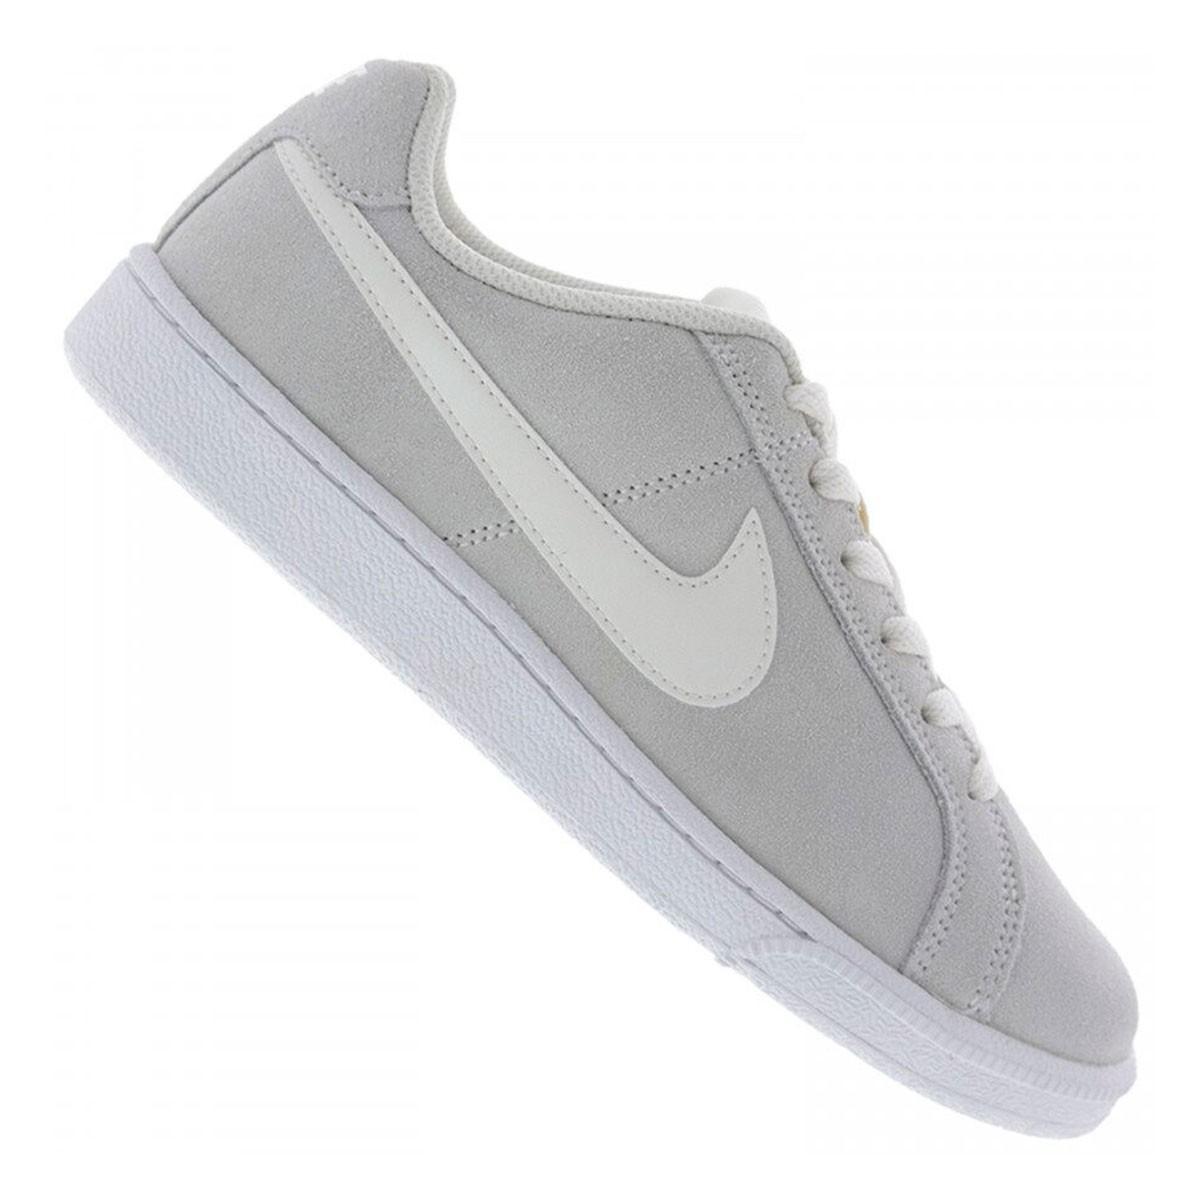 Tênis WMNS Nike Court Royale Prem Feminino Branco Grafite